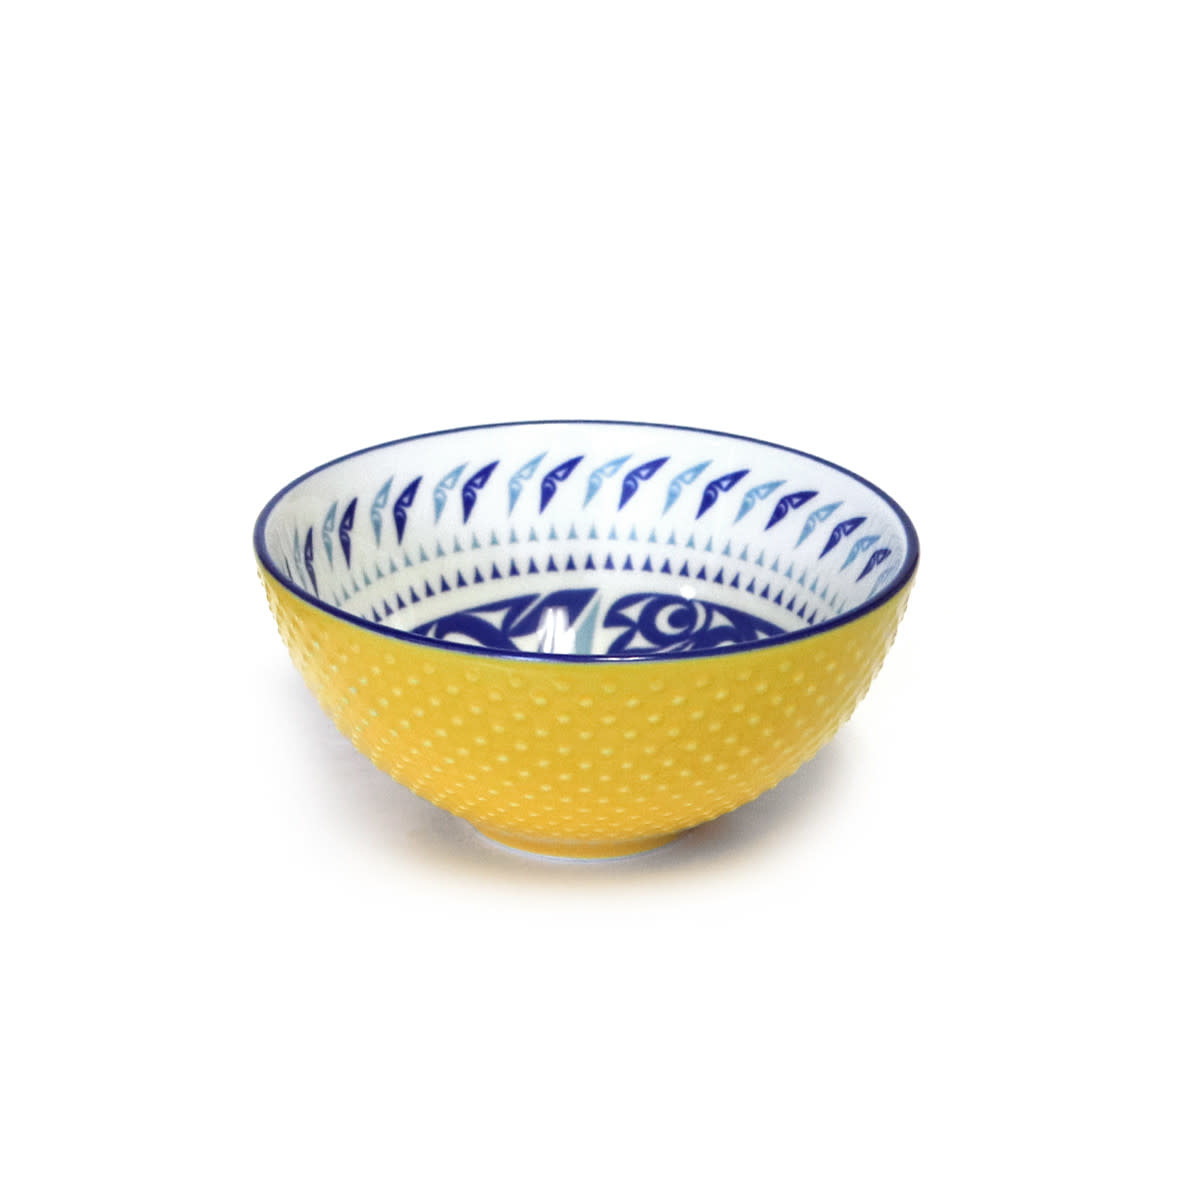 Porcelain Art Bowl - Small-3